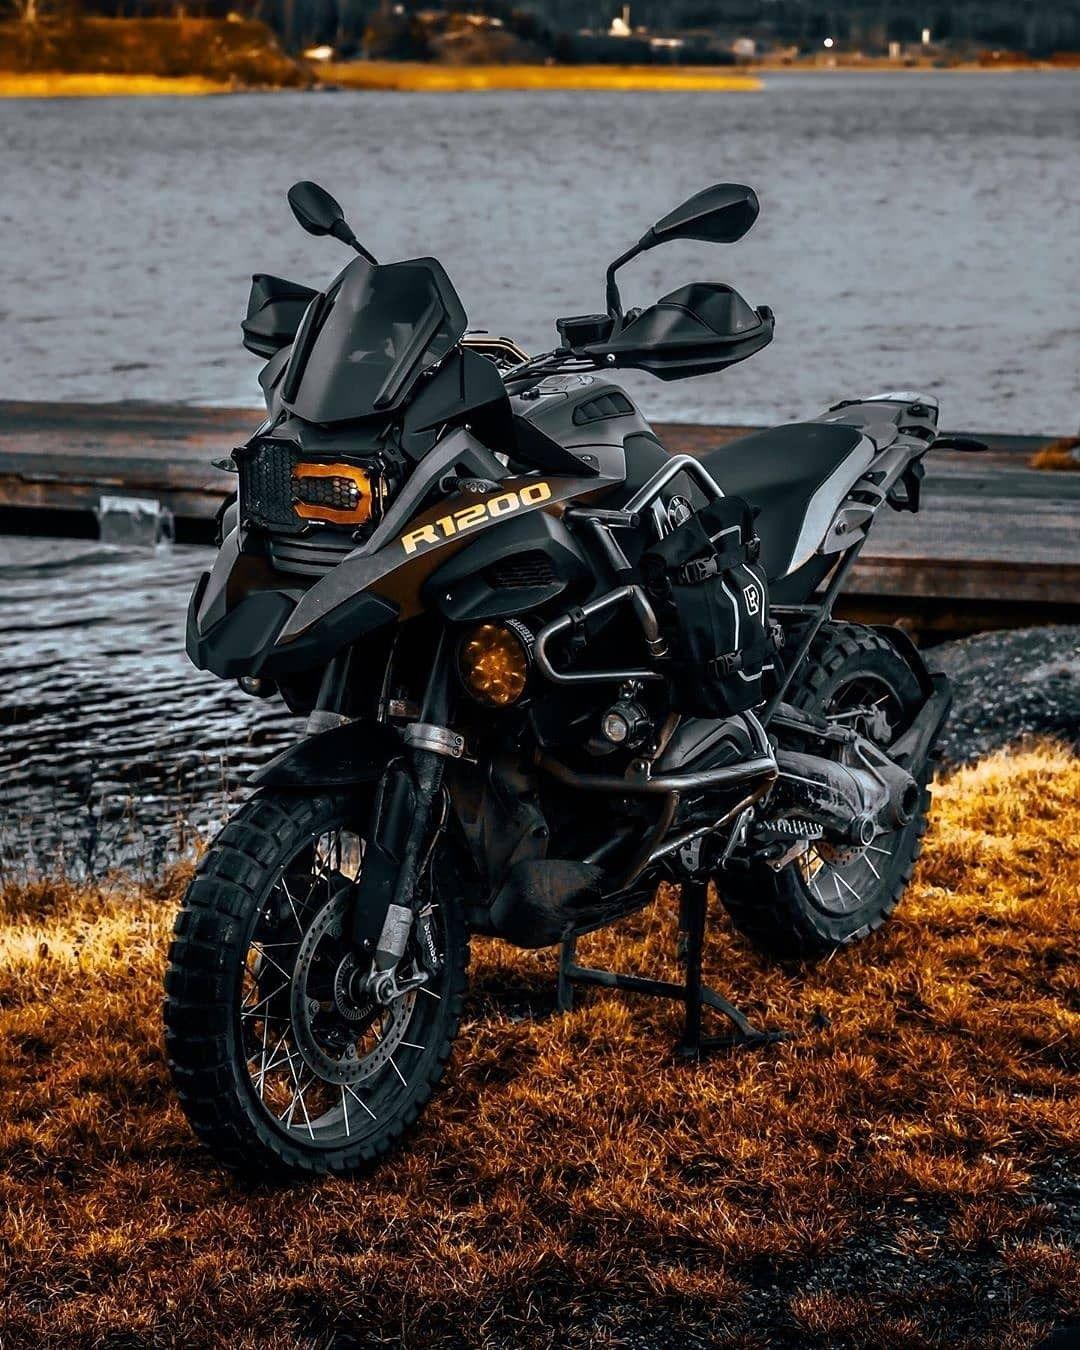 Hellraisermw Shop Redbubble In 2021 Adventure Bike Motorcycles Bmw Adventure Bike Bmw Motorcycle Adventure